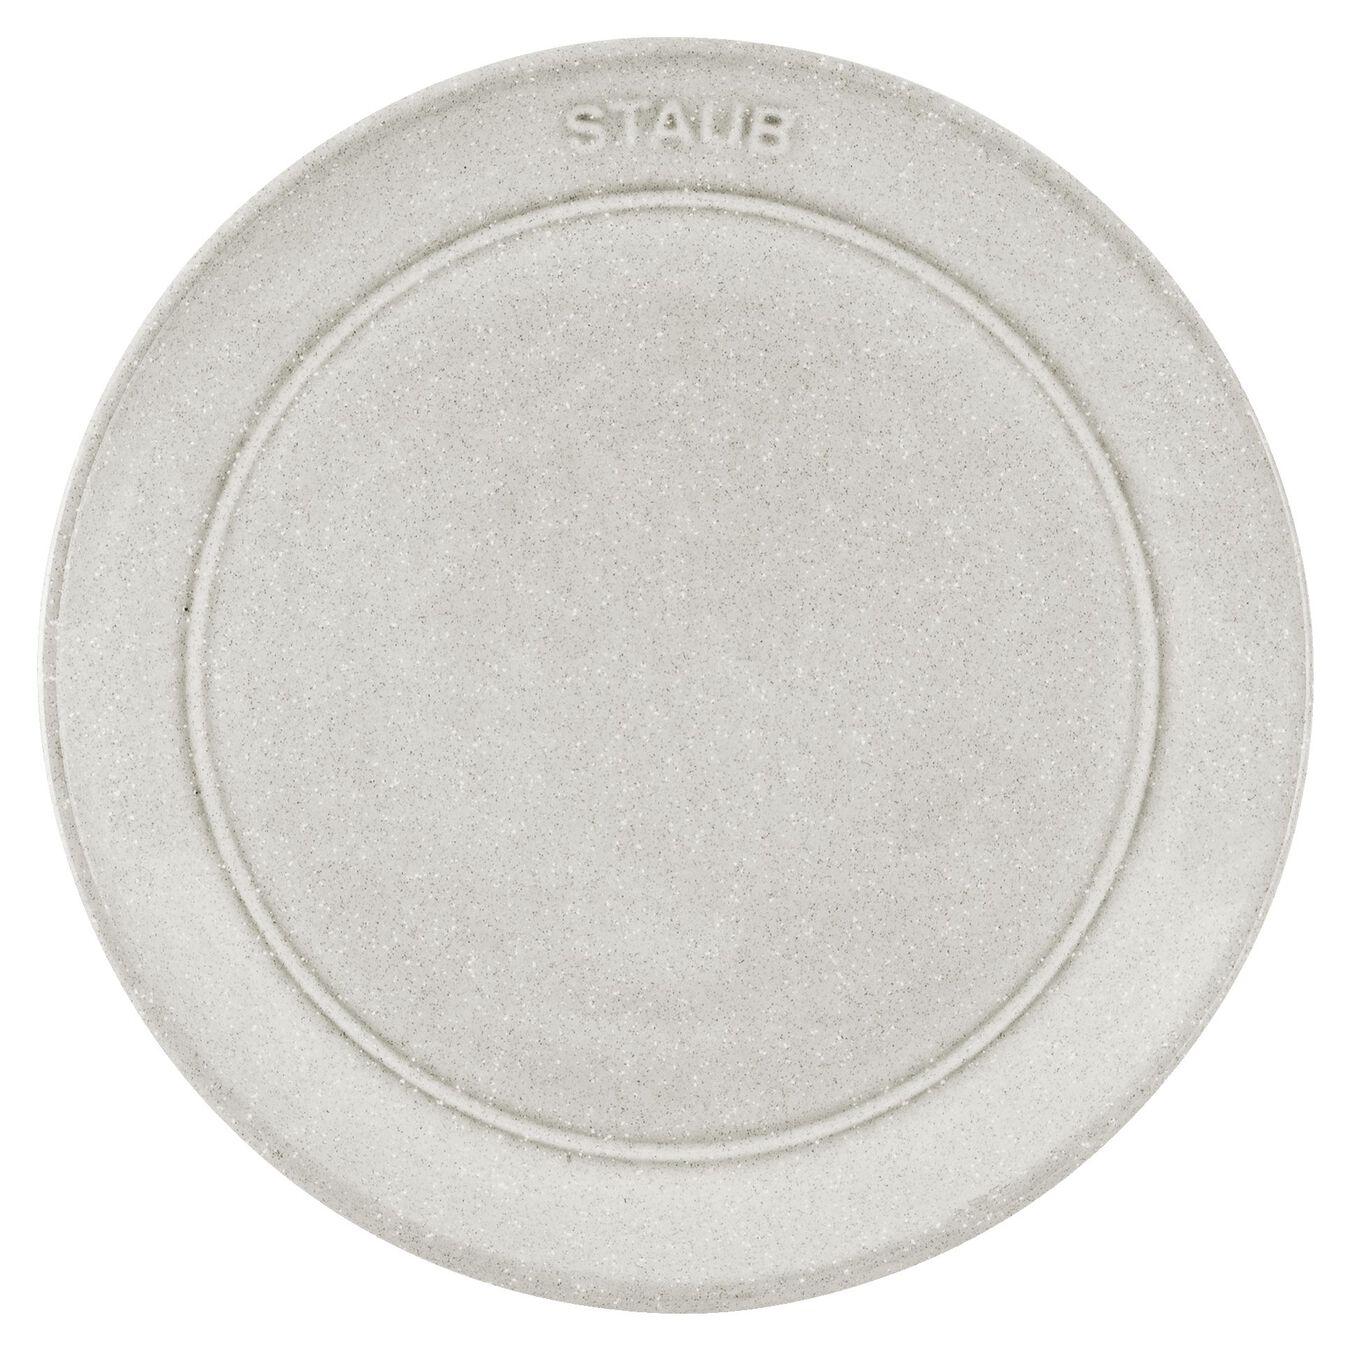 Teller flach 15 cm, Keramik, Weisser Trüffel,,large 2